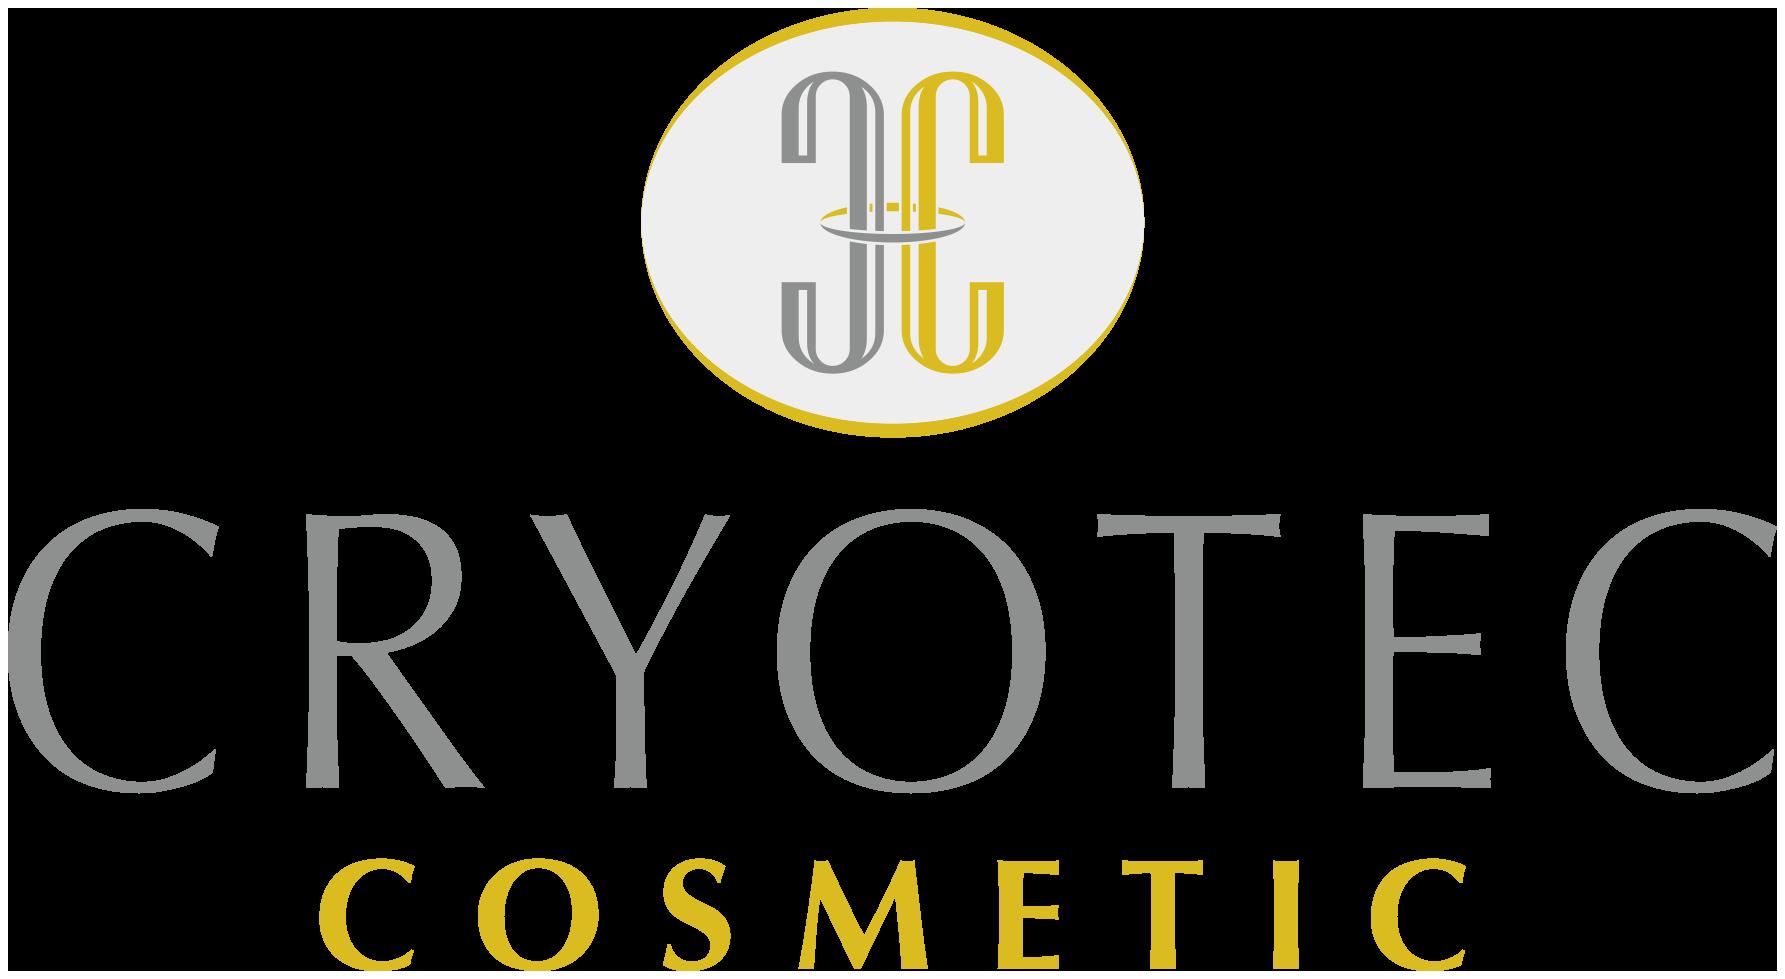 Cryotec Cosmetic-Logo